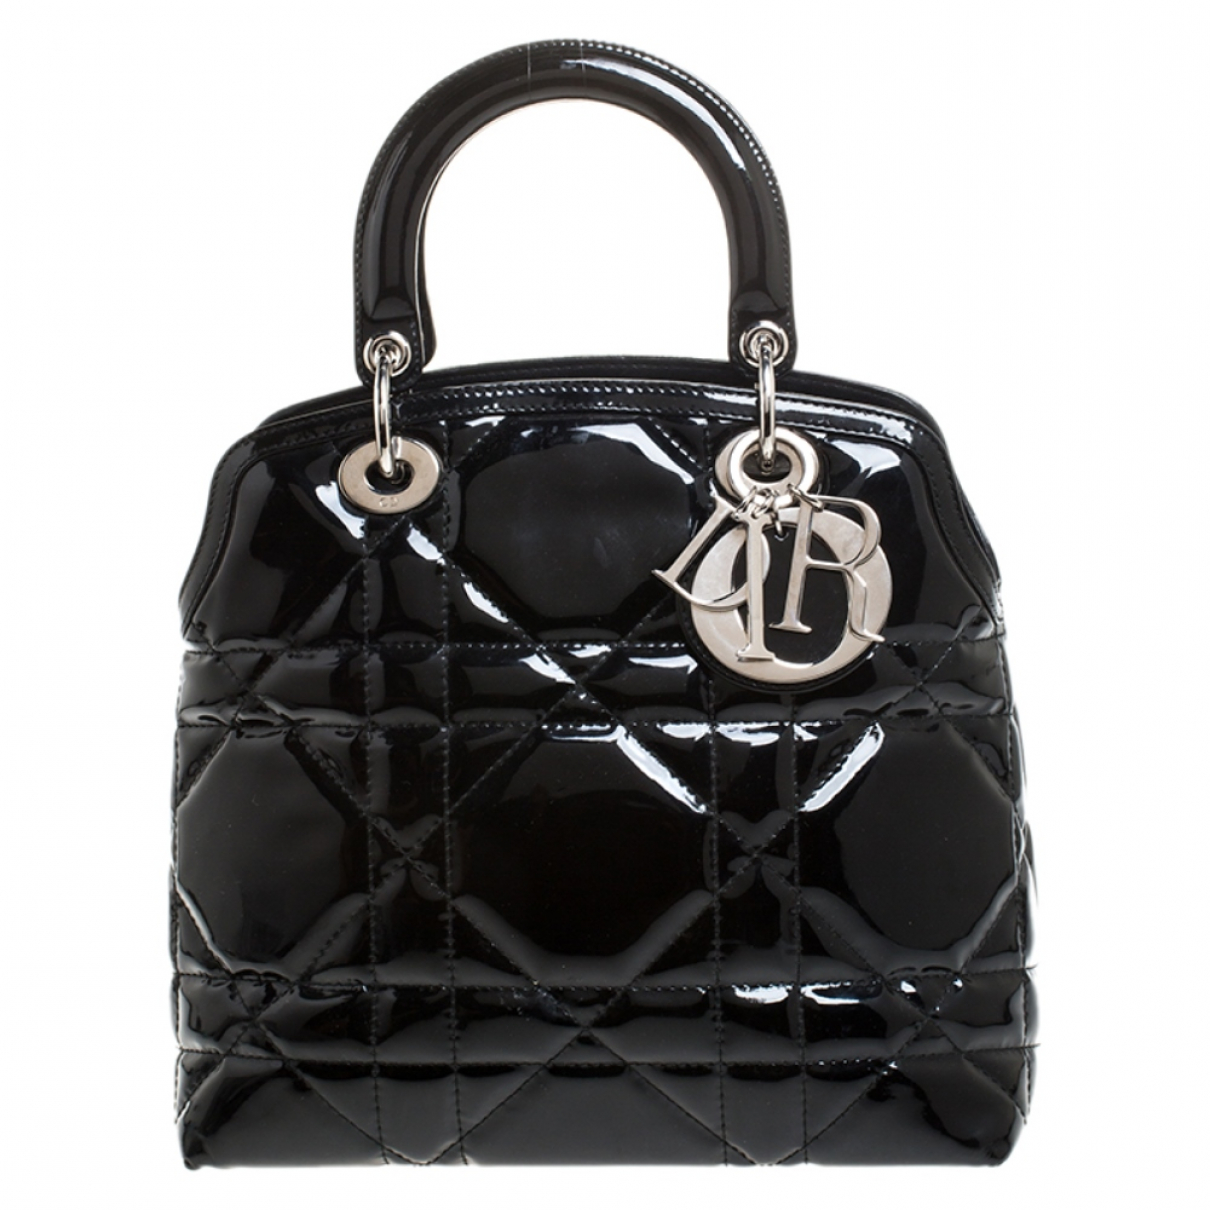 Dior N Black Patent leather handbag for Women N